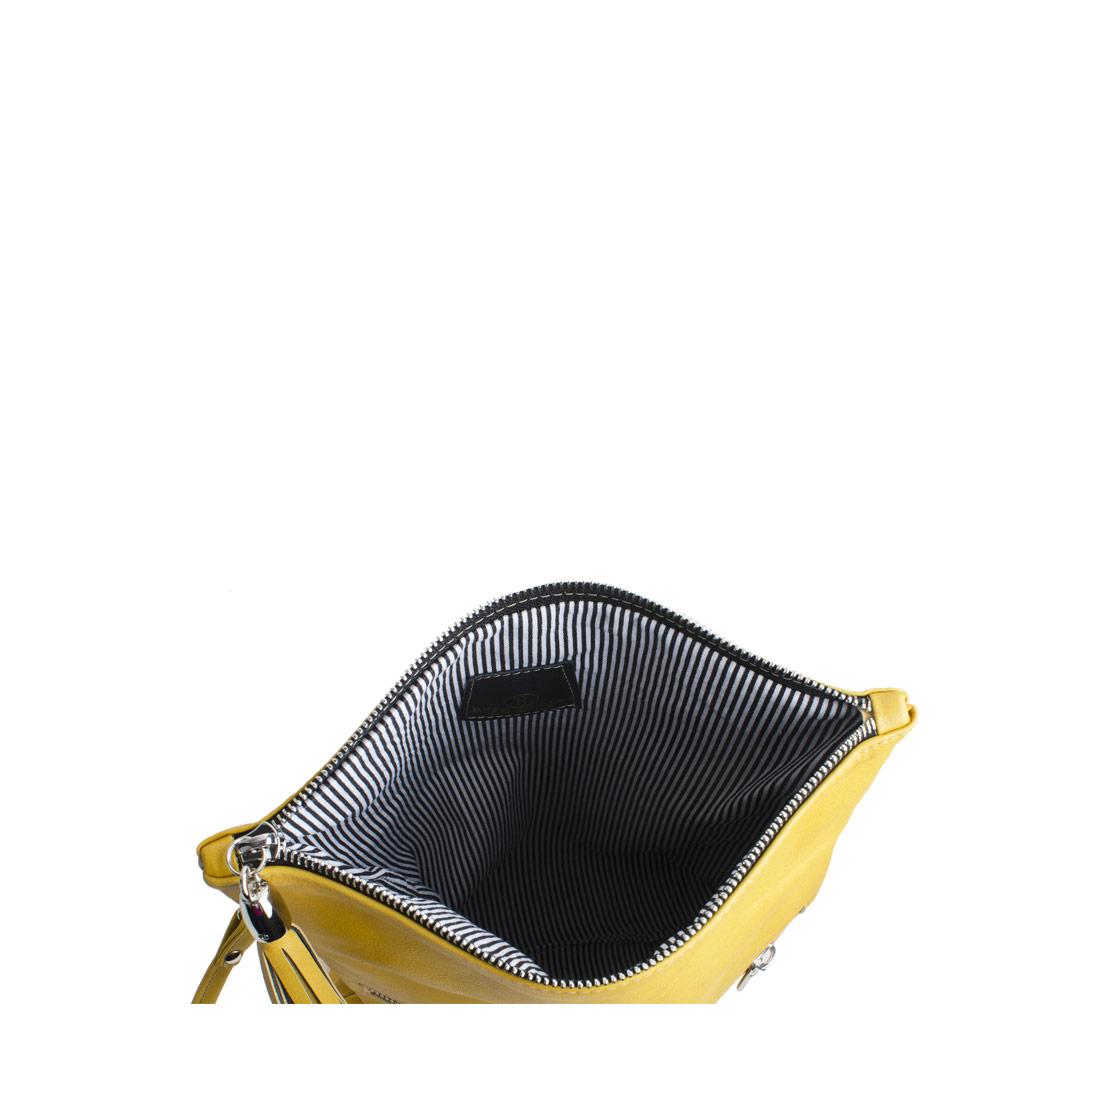 Sofia Yellow Across Body Bag